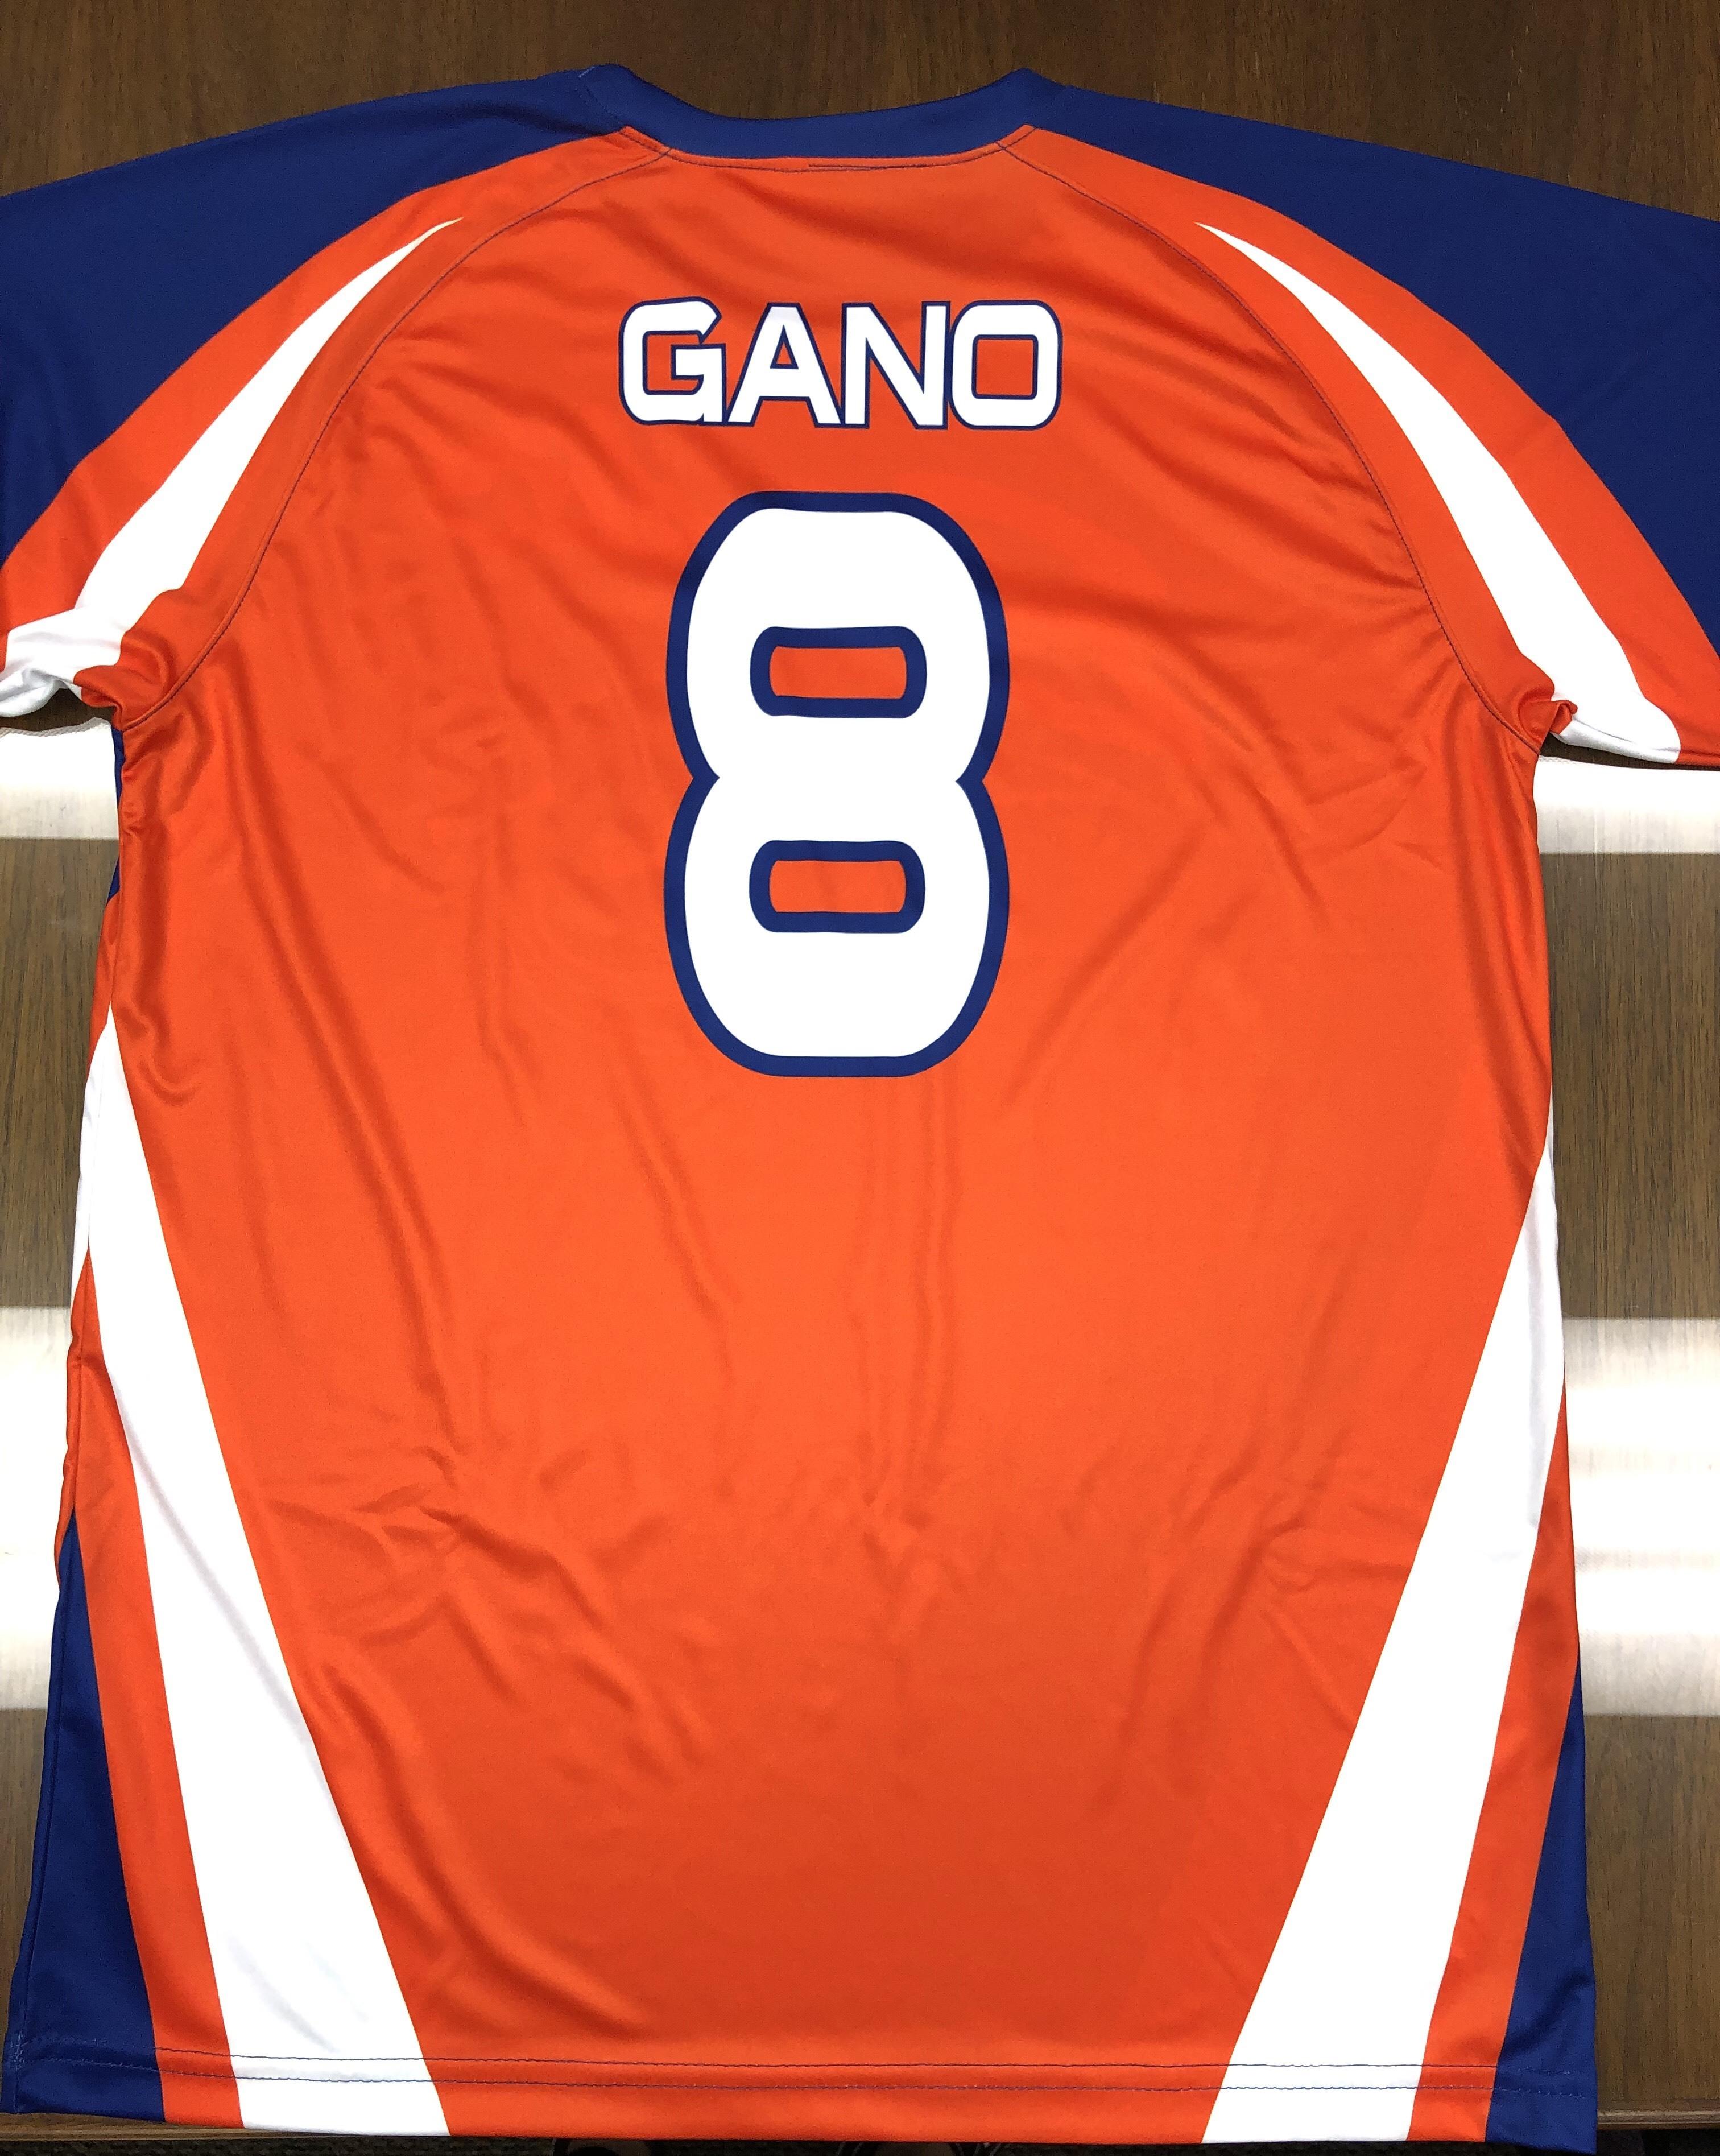 Courtney Gano Batting Practice Replica Jersey 25009